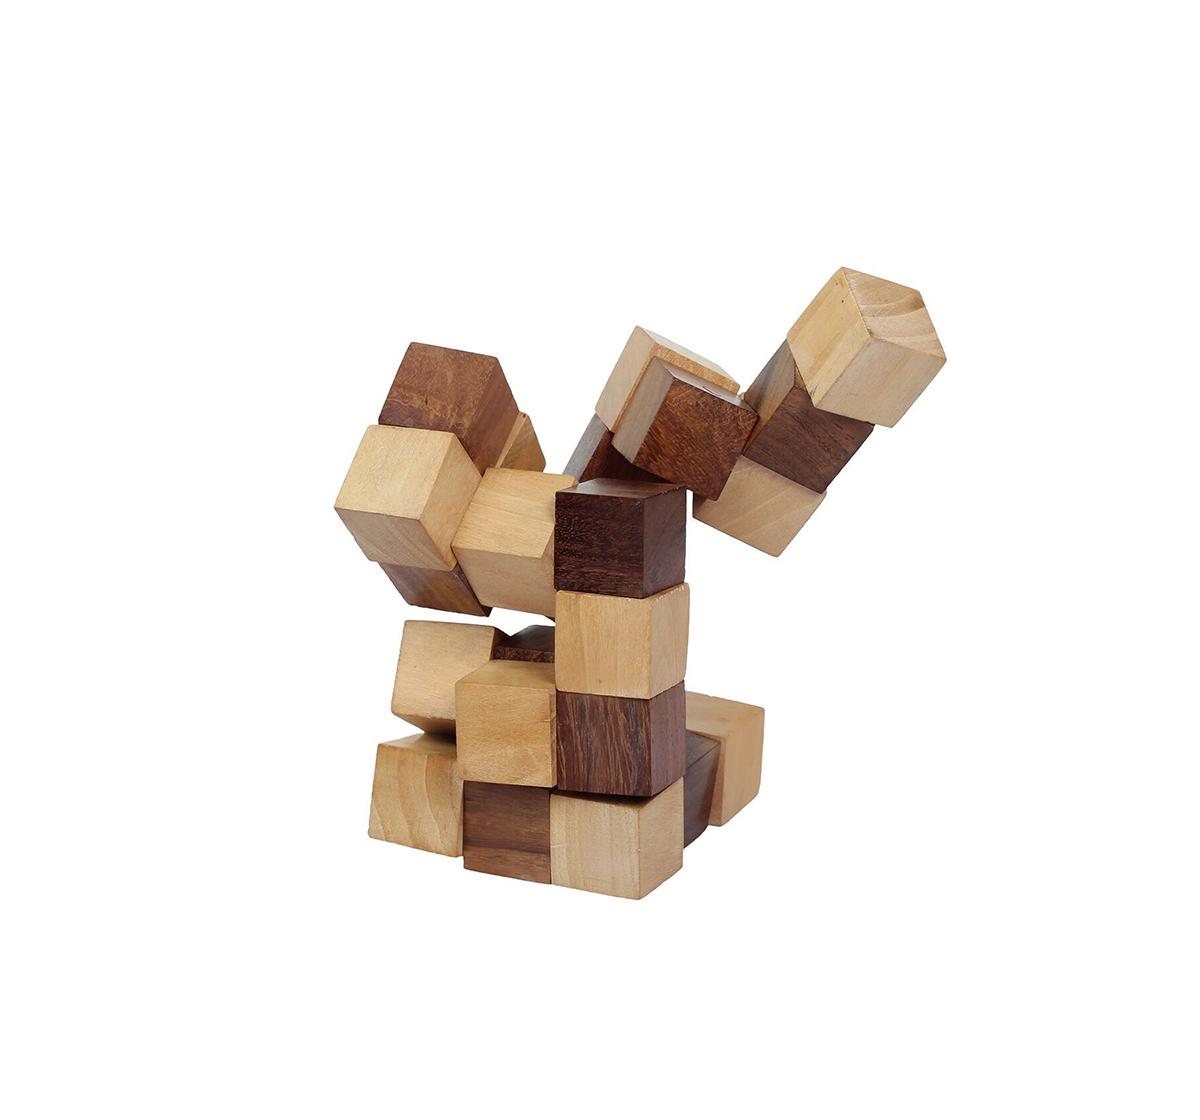 Desi Toys | Desi Toys Snake Cube Puzzle Ghan Akar Brain Teaser Game for Kids age 5Y+ (Brown)